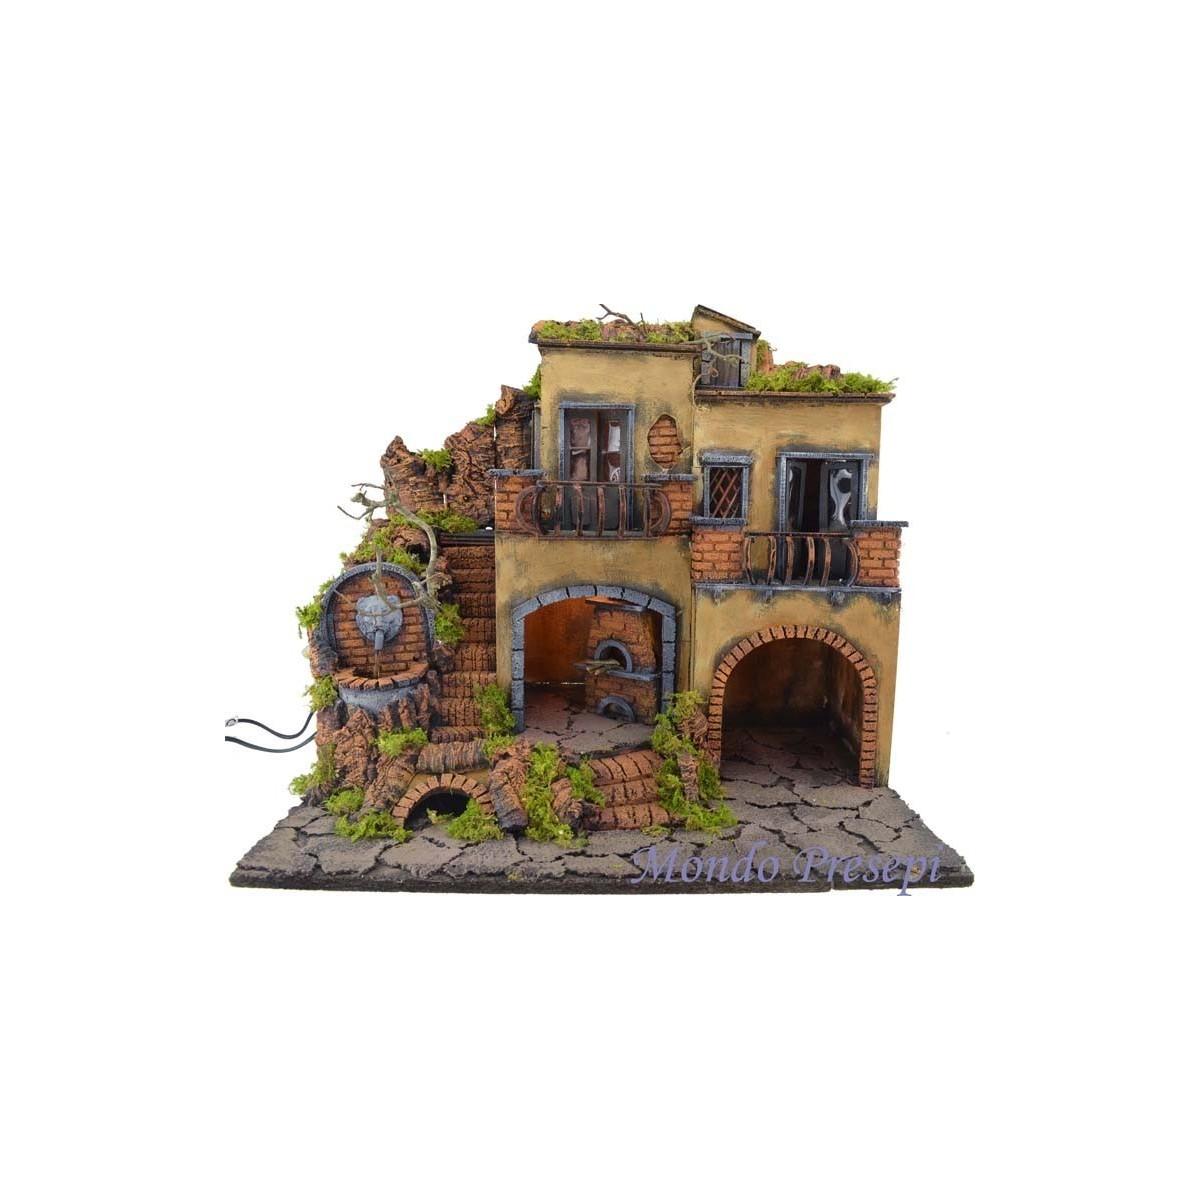 Presepe con borgo illuminato con fontana e forno 50x40 - Mondo Presepi